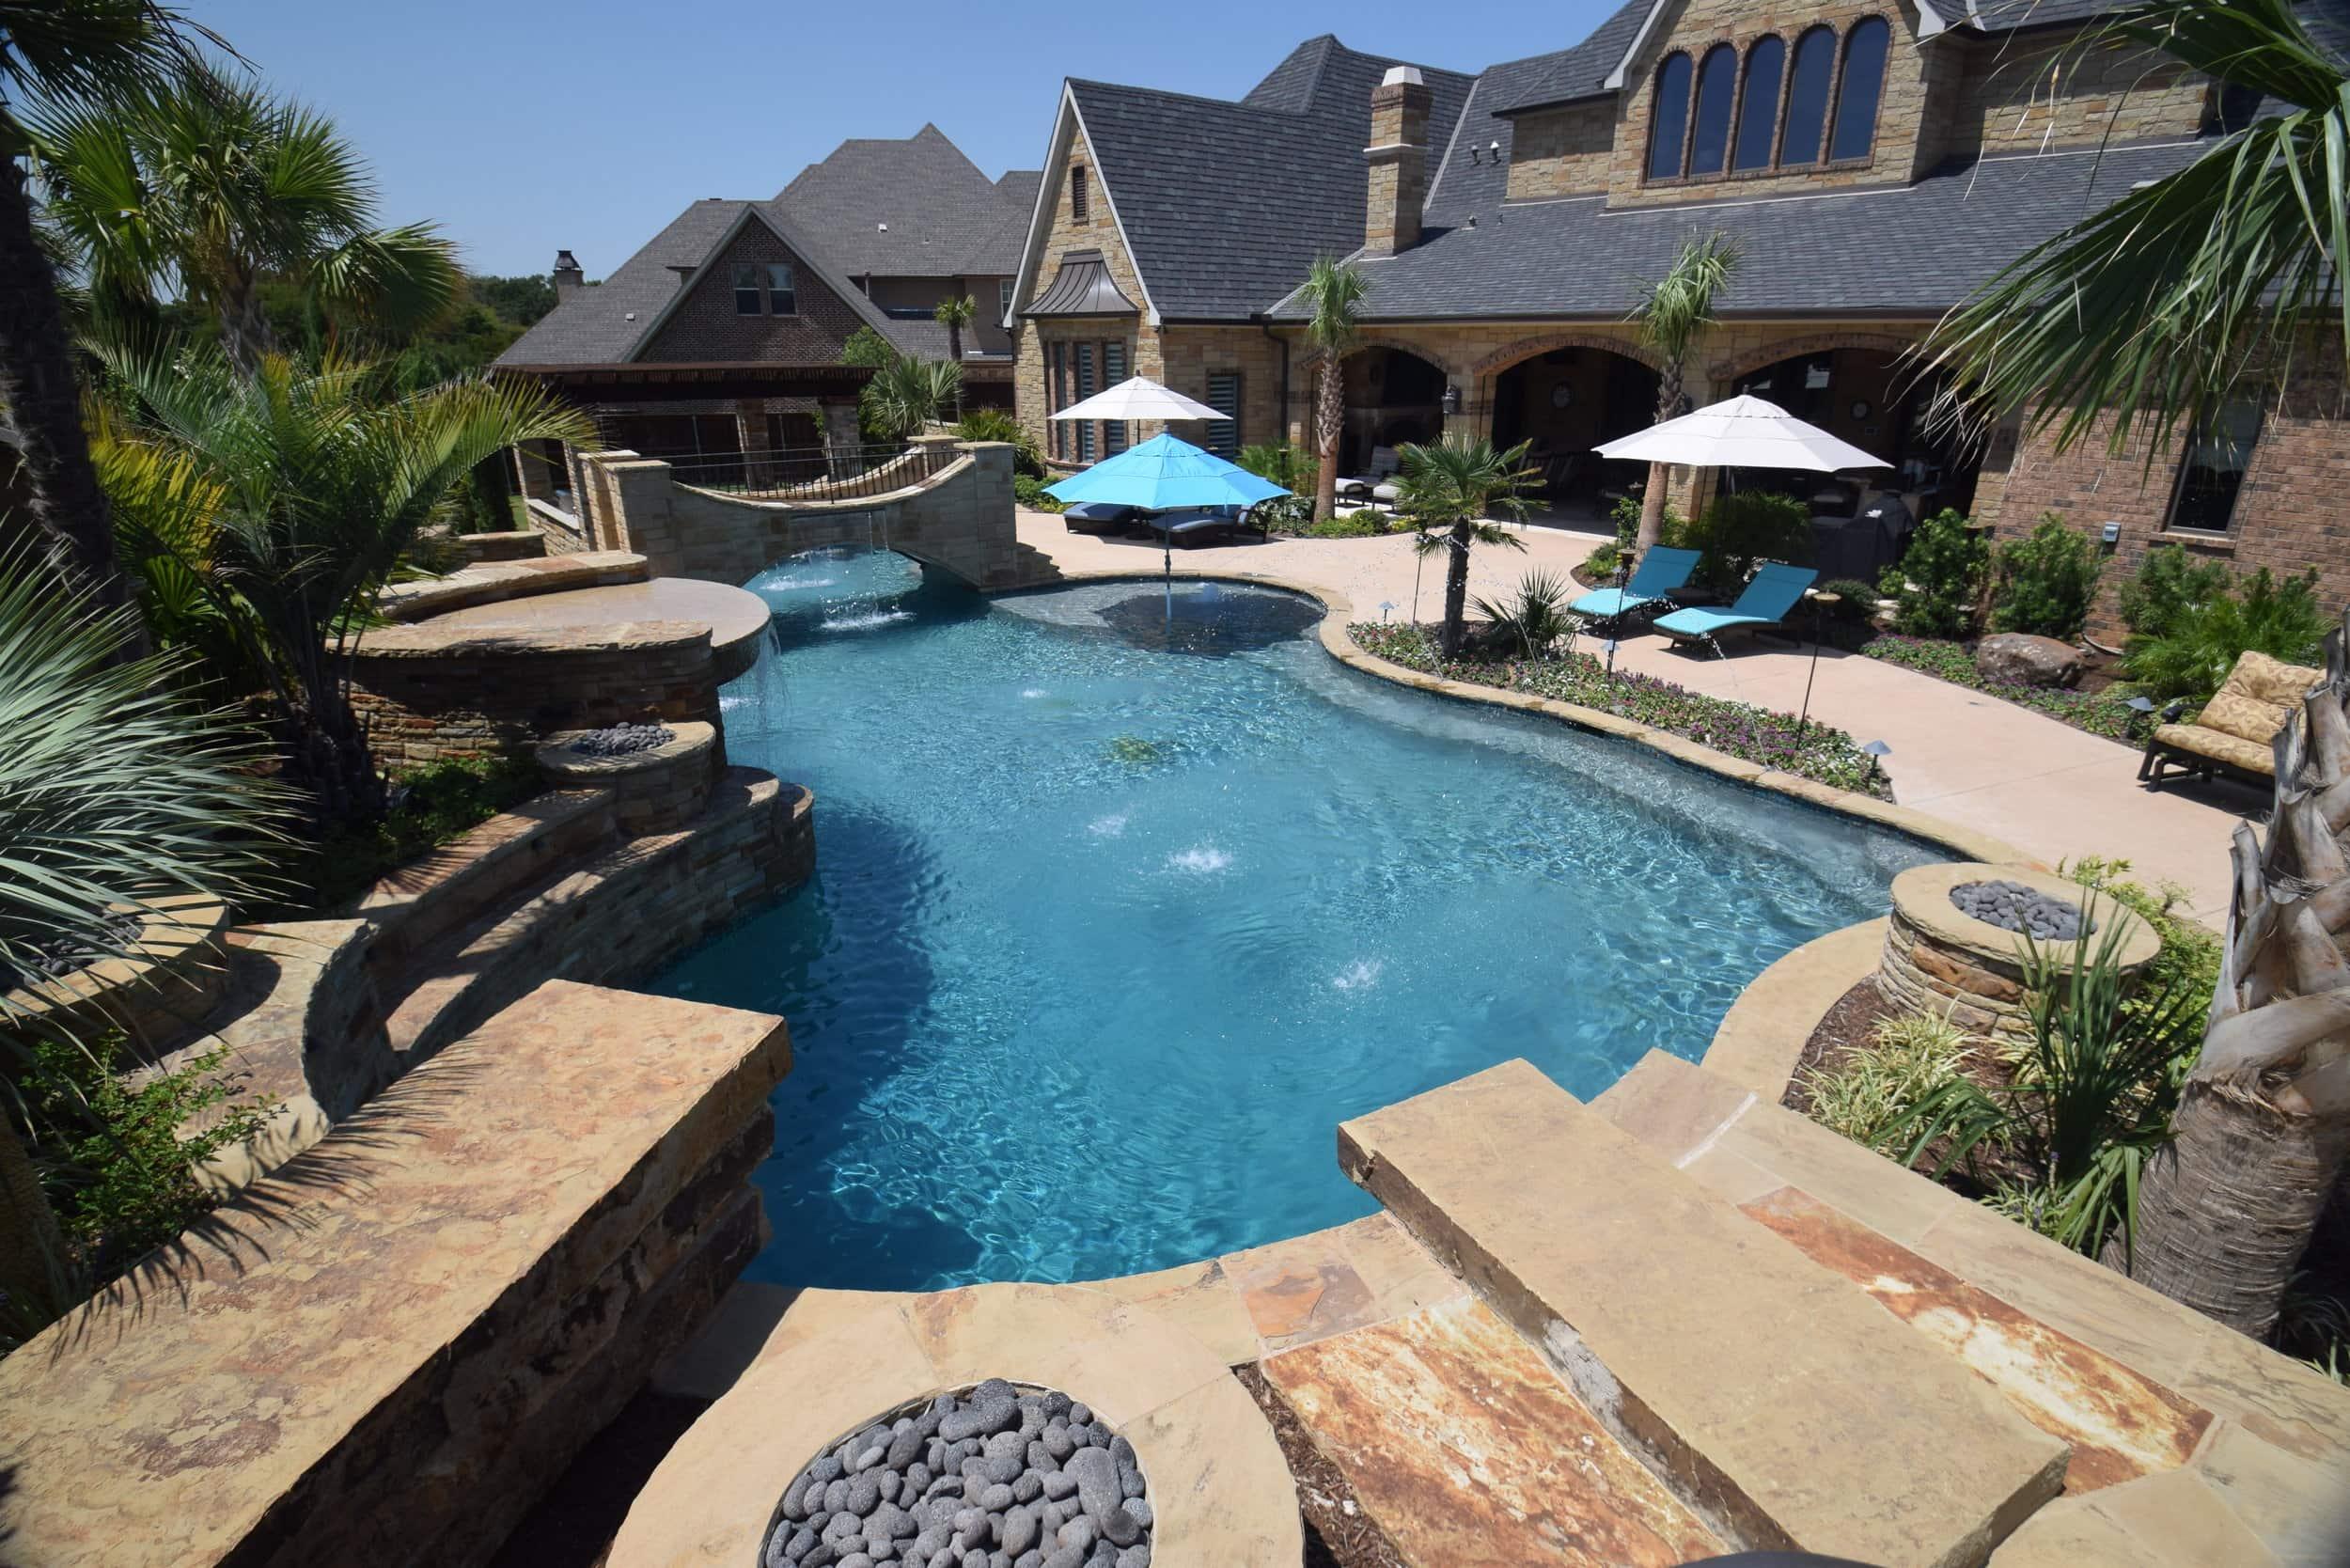 Texas Trophy Pools image 16